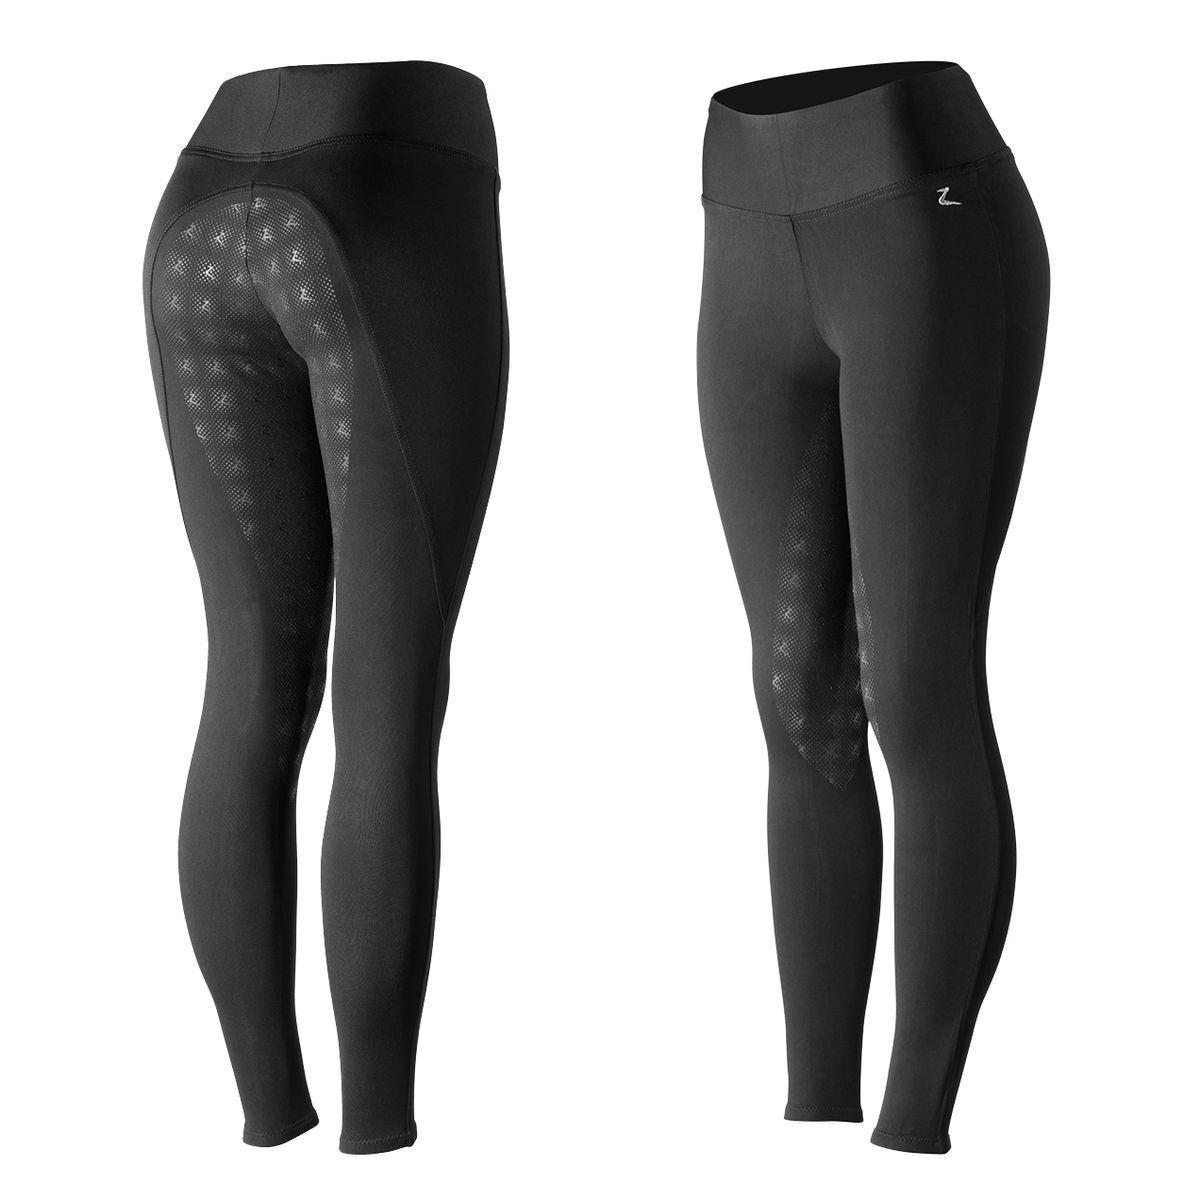 Horze Damas Juliet Negro Pantalones de montar de asiento completo inglés Hyper Flex Calzas De Venta